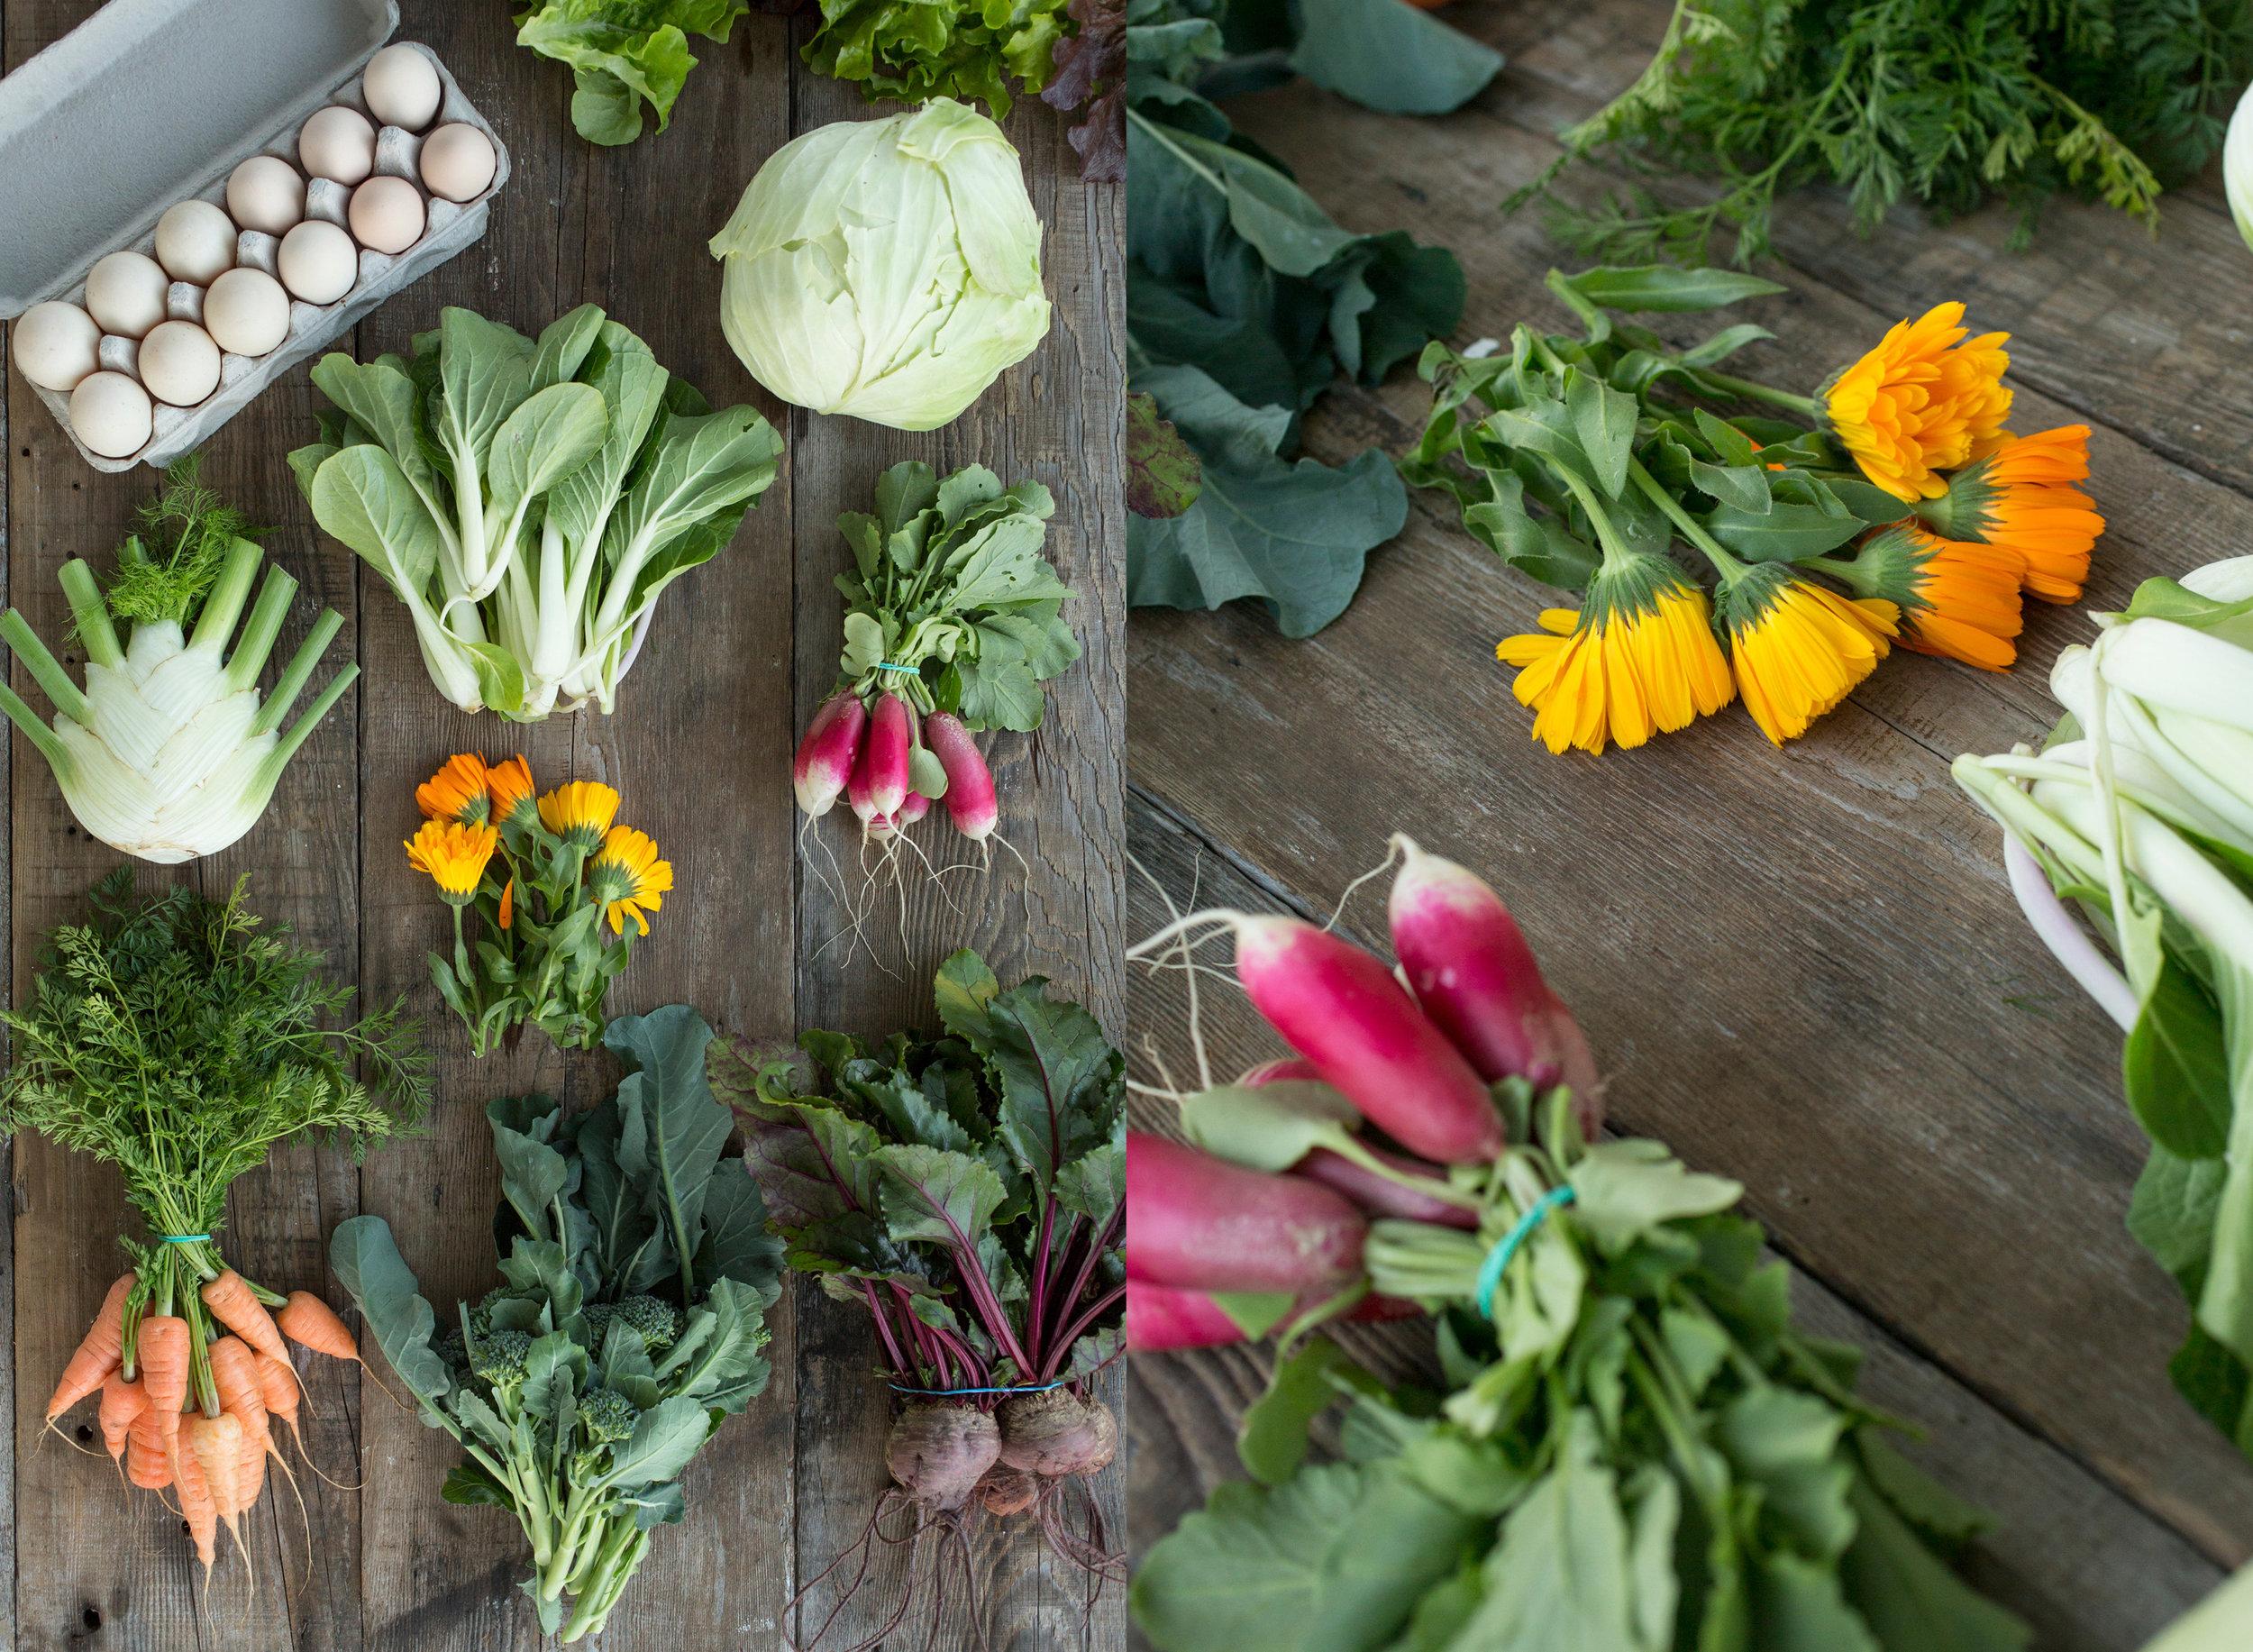 Fresh produce from Piccolo Farm